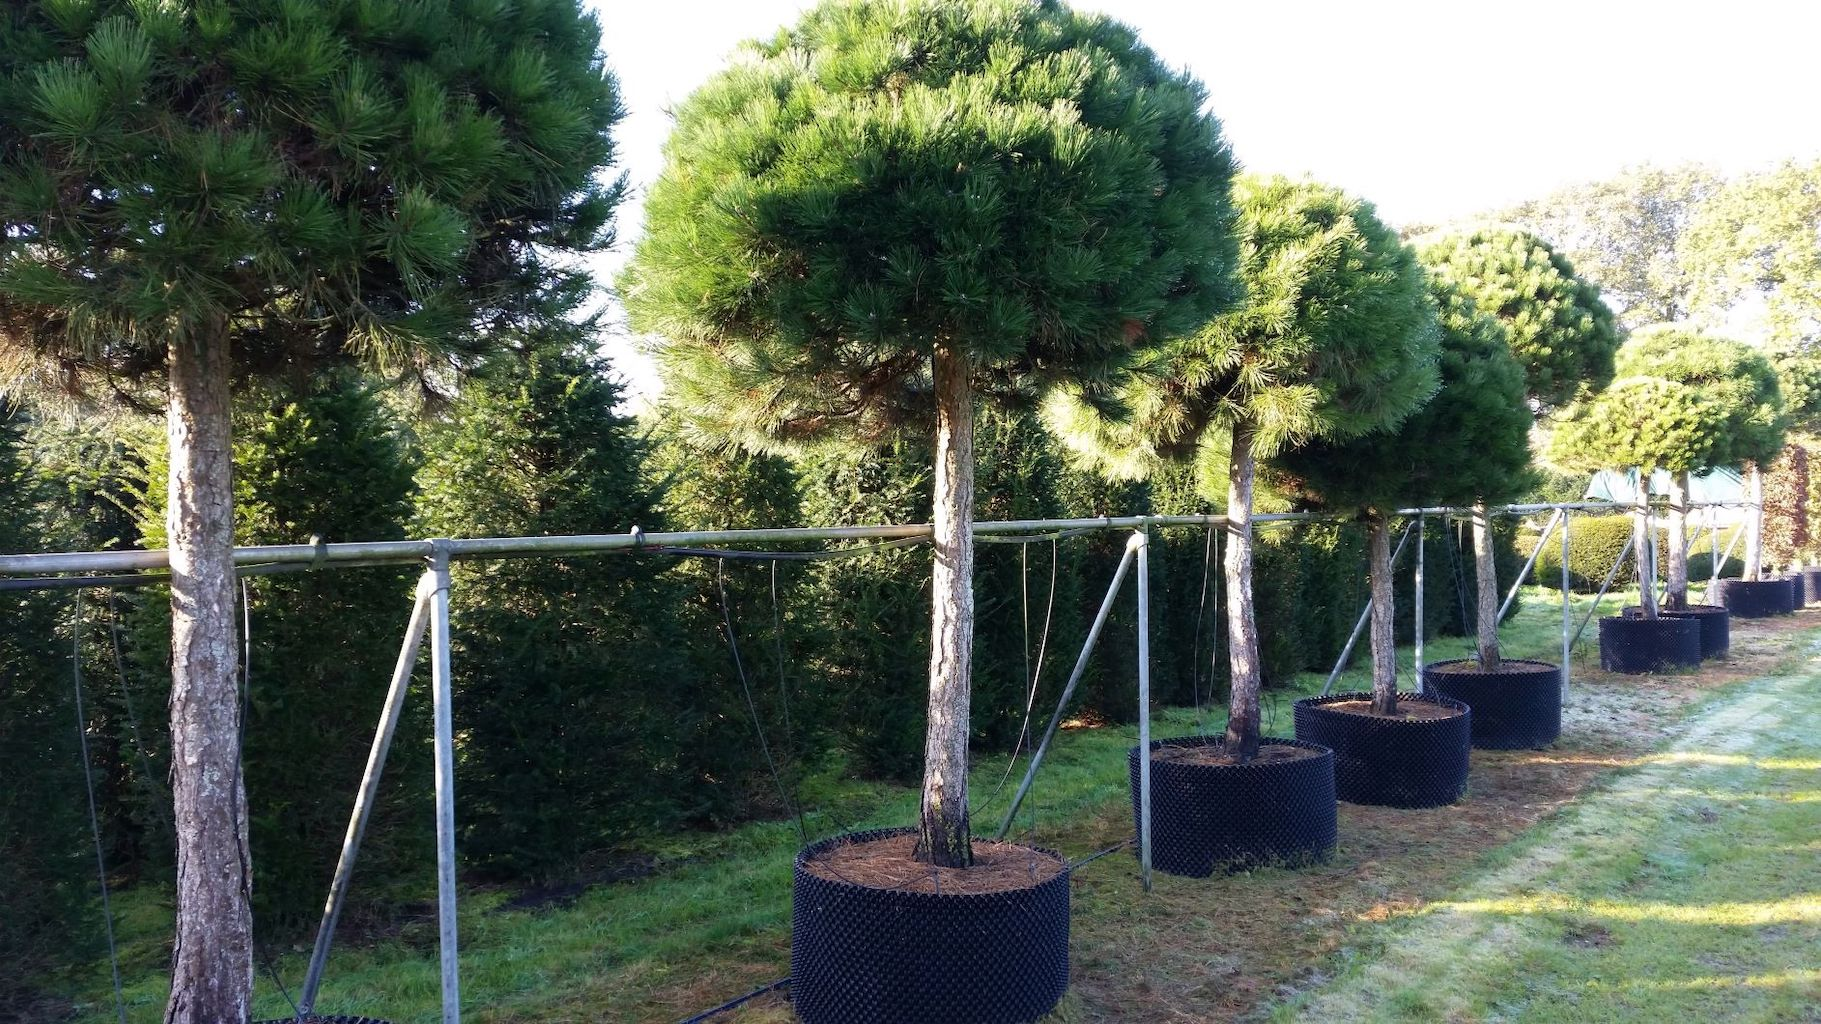 Pinus nigra 'Nigra' lollipop trees